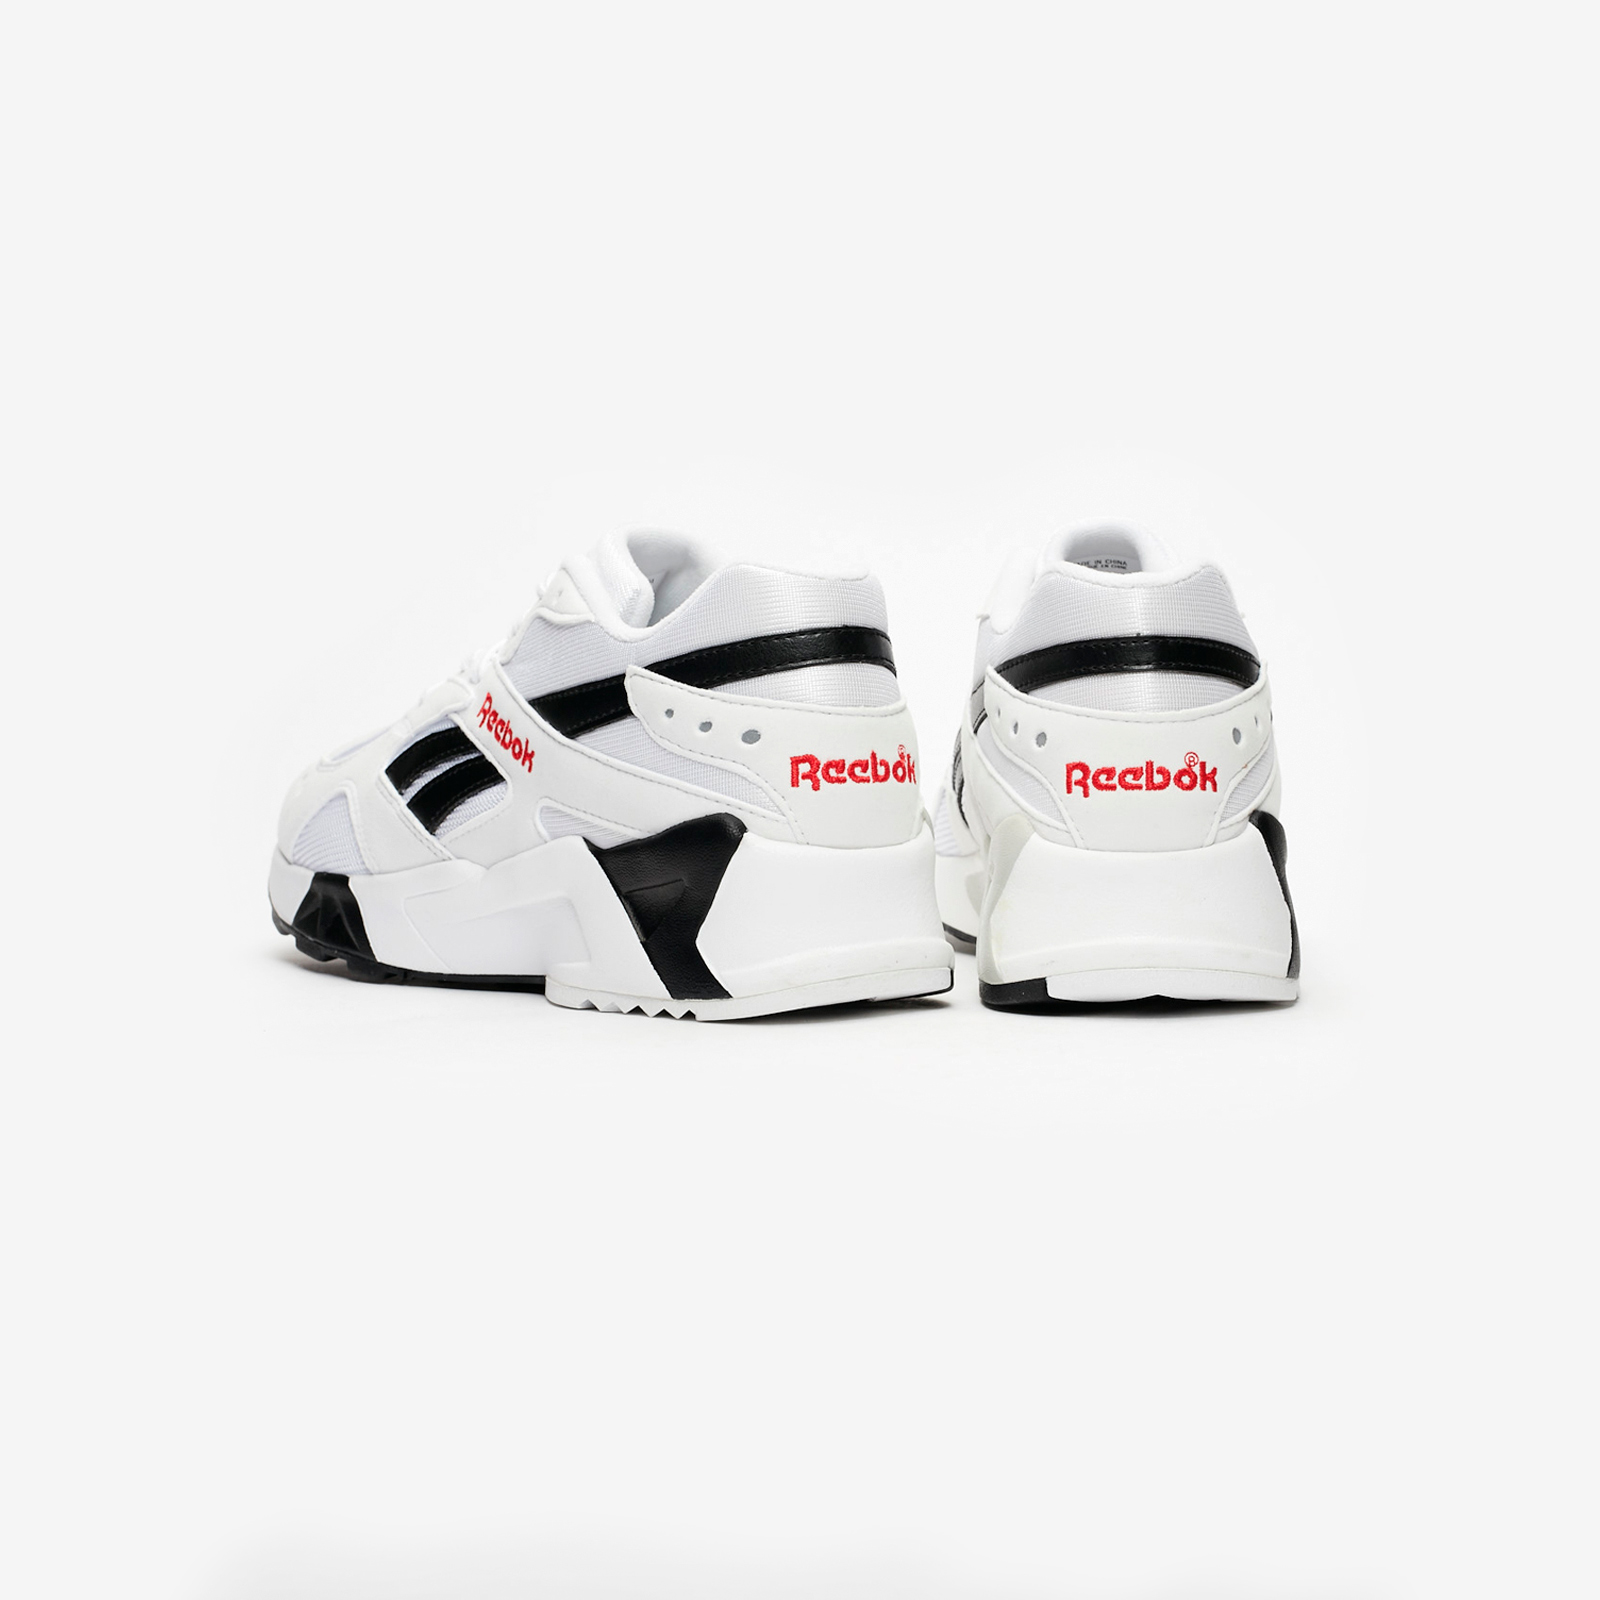 8b9747c6f09 Reebok Aztrek - Cn7187 - Sneakersnstuff